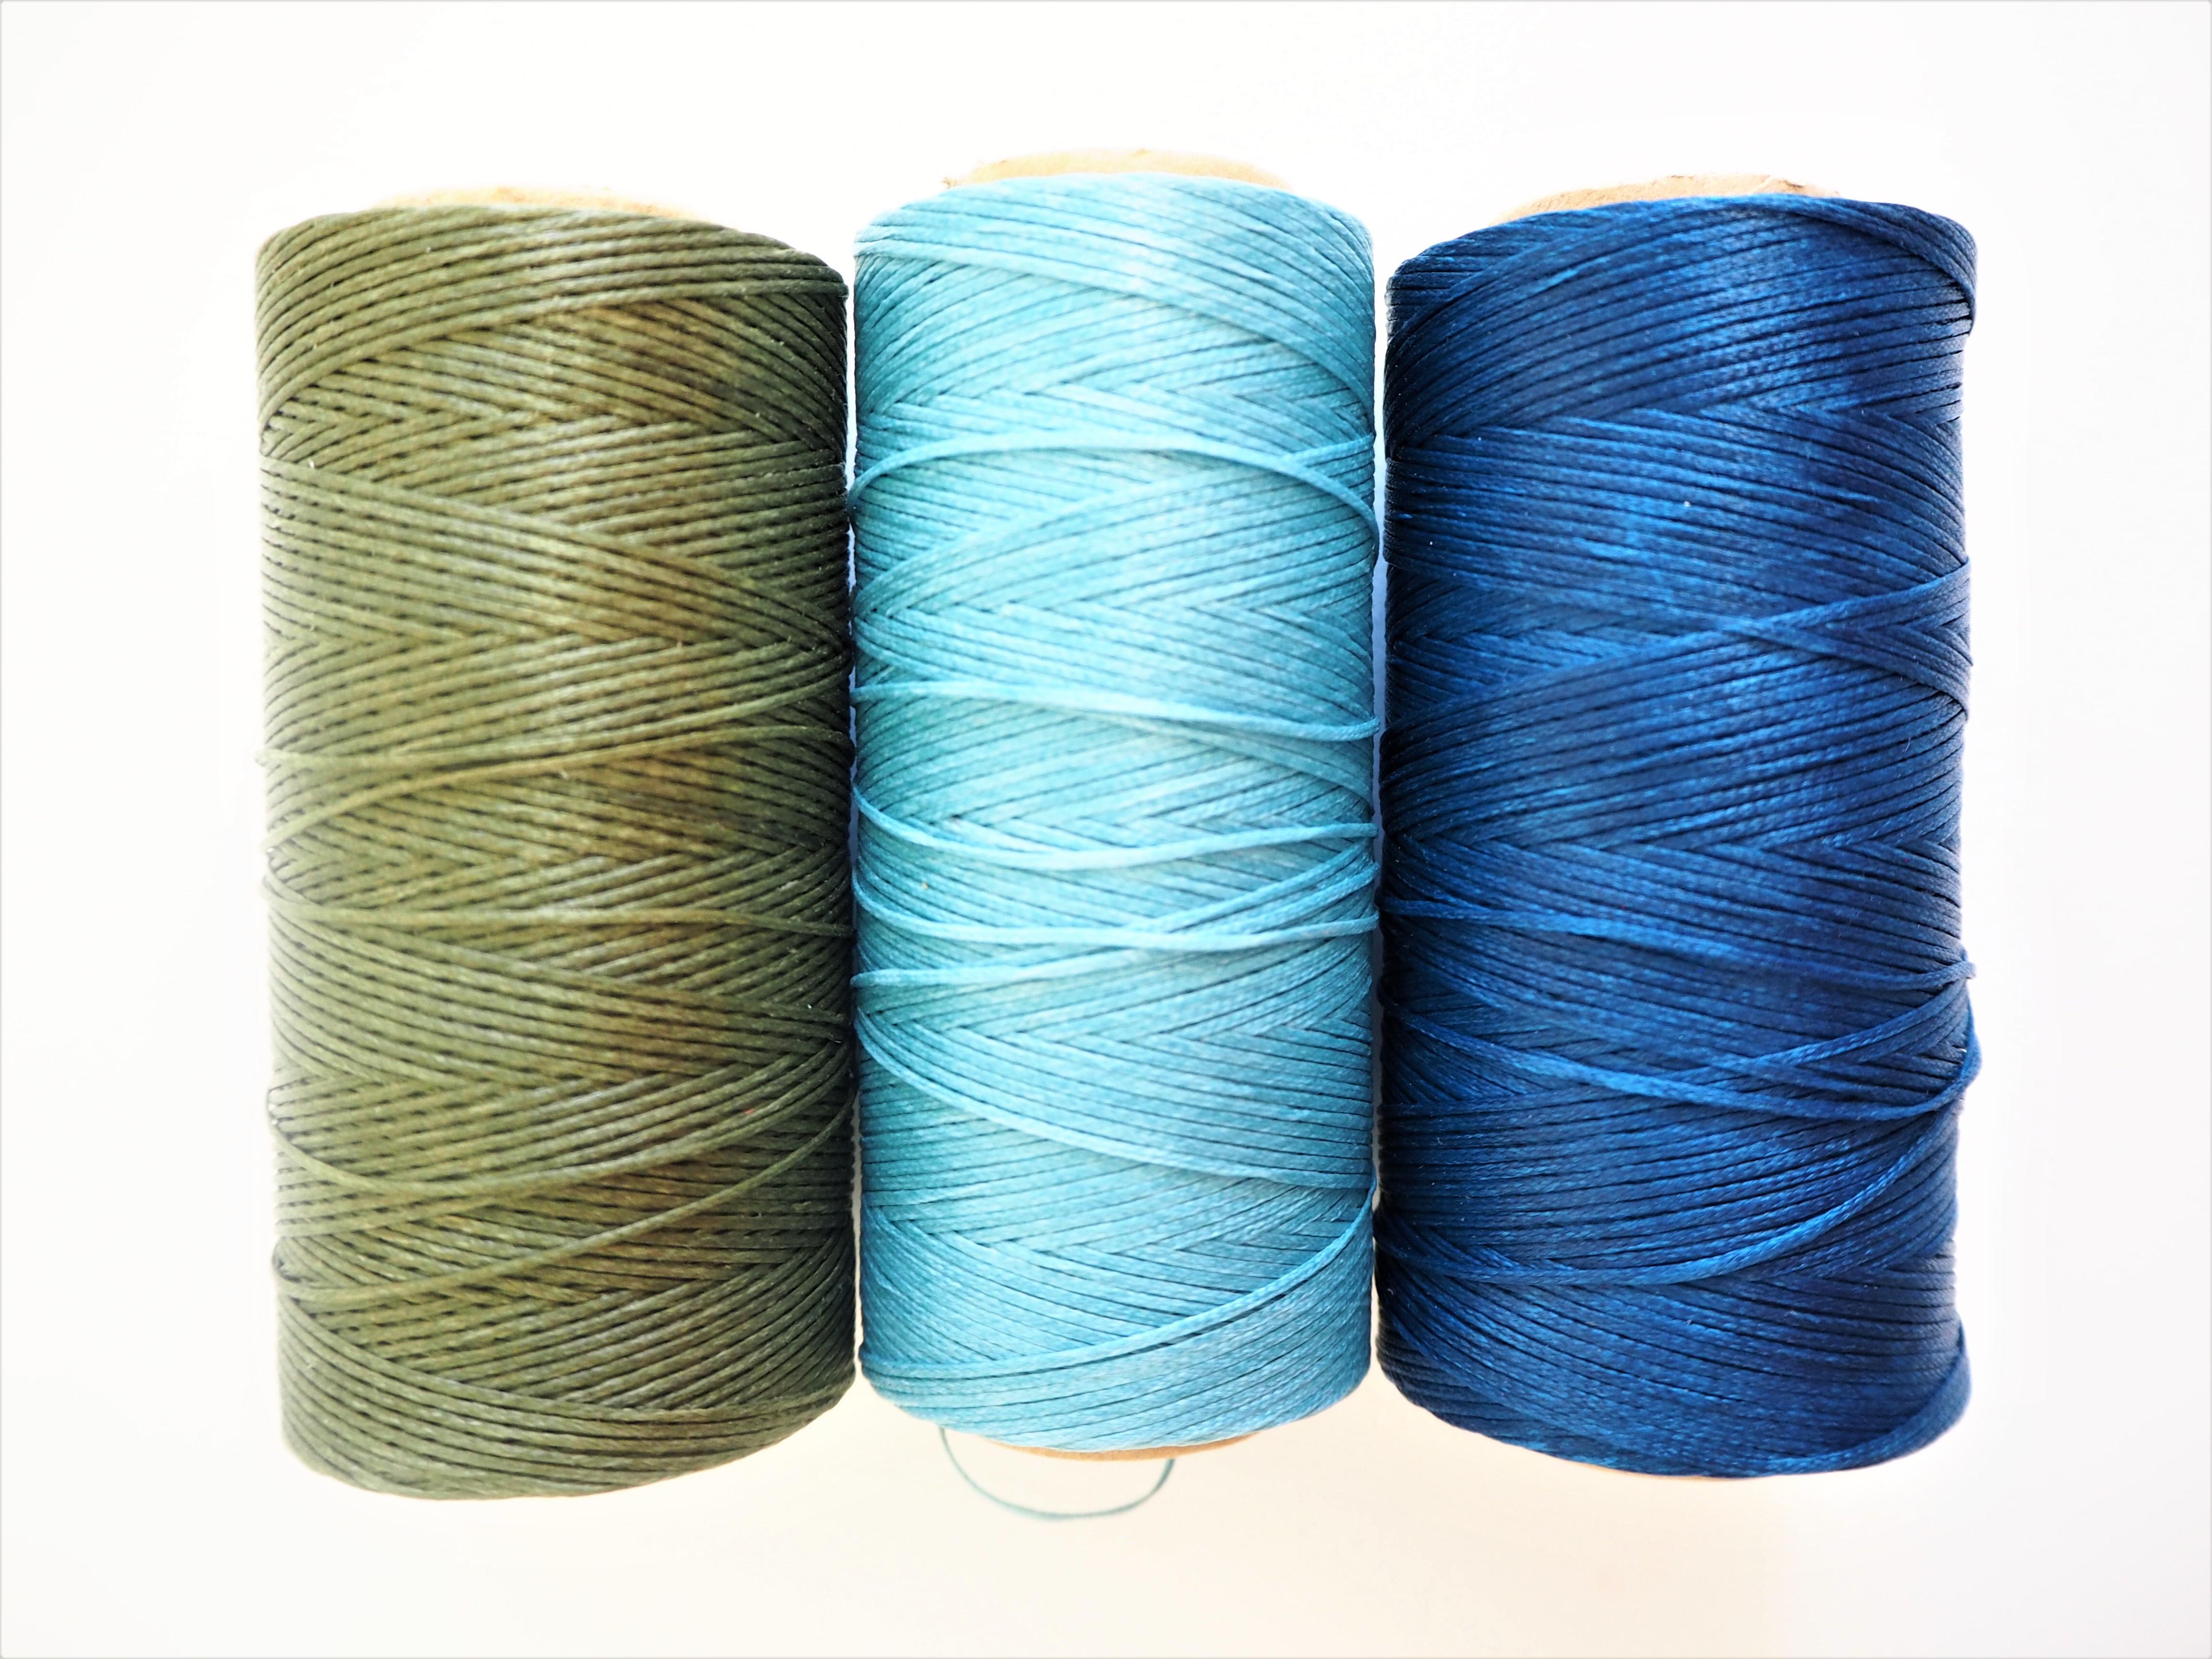 Waxed Bookbinding Thread - Moss Green, Turquoise & Deep Sea Blue